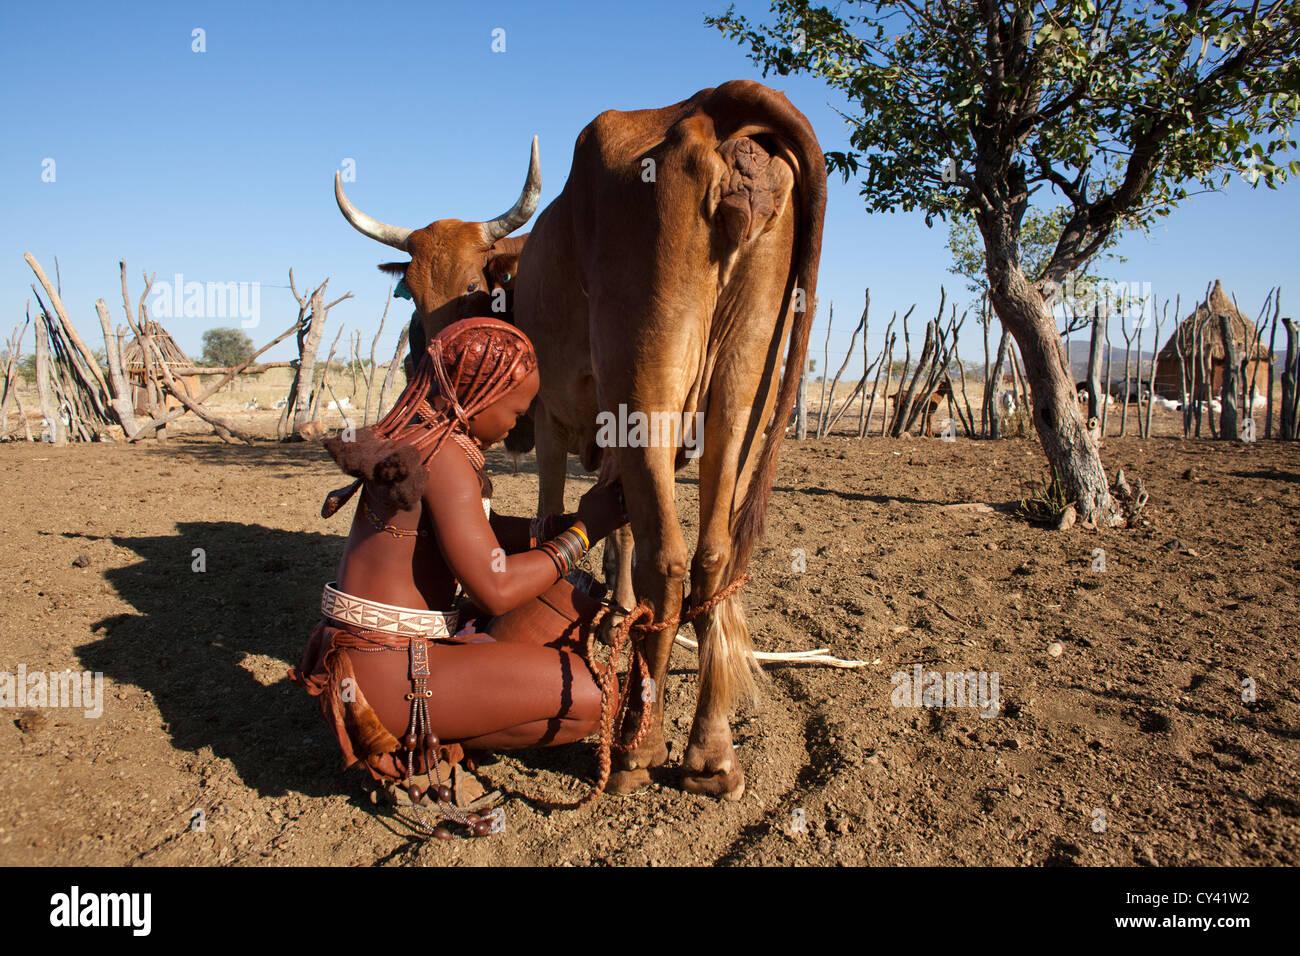 Himba tribe in Namibia. - Stock Image